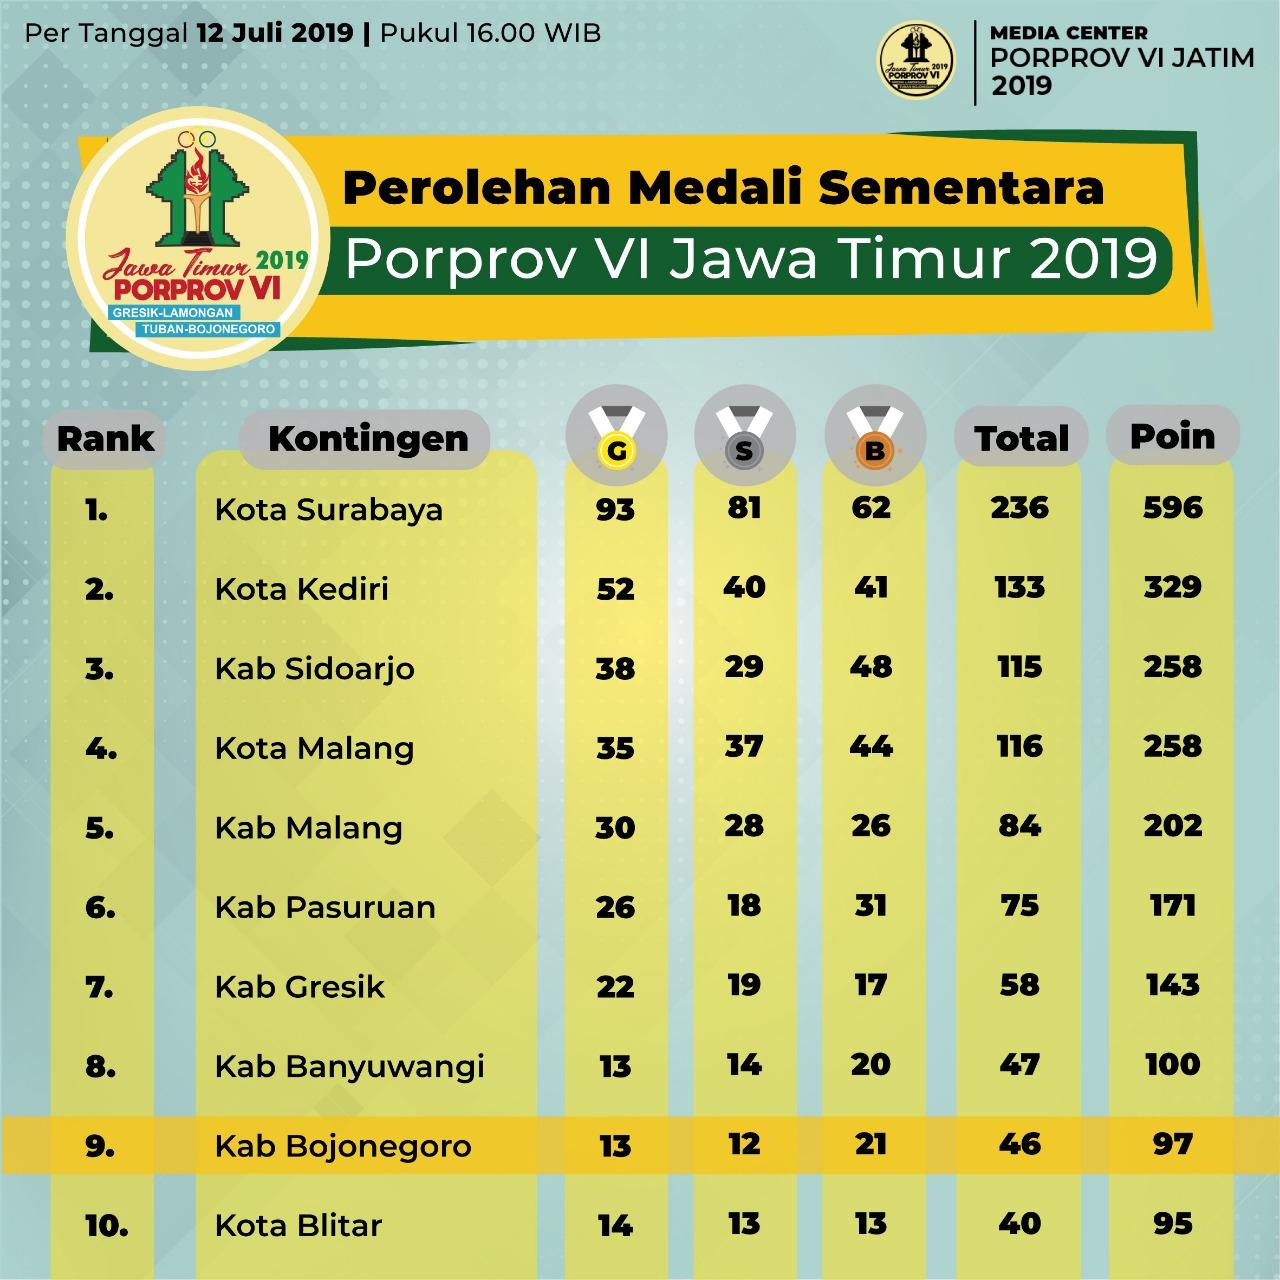 infografis perolehan medali sementara, per tanggal 12 Juli 2019, pukul 16.00